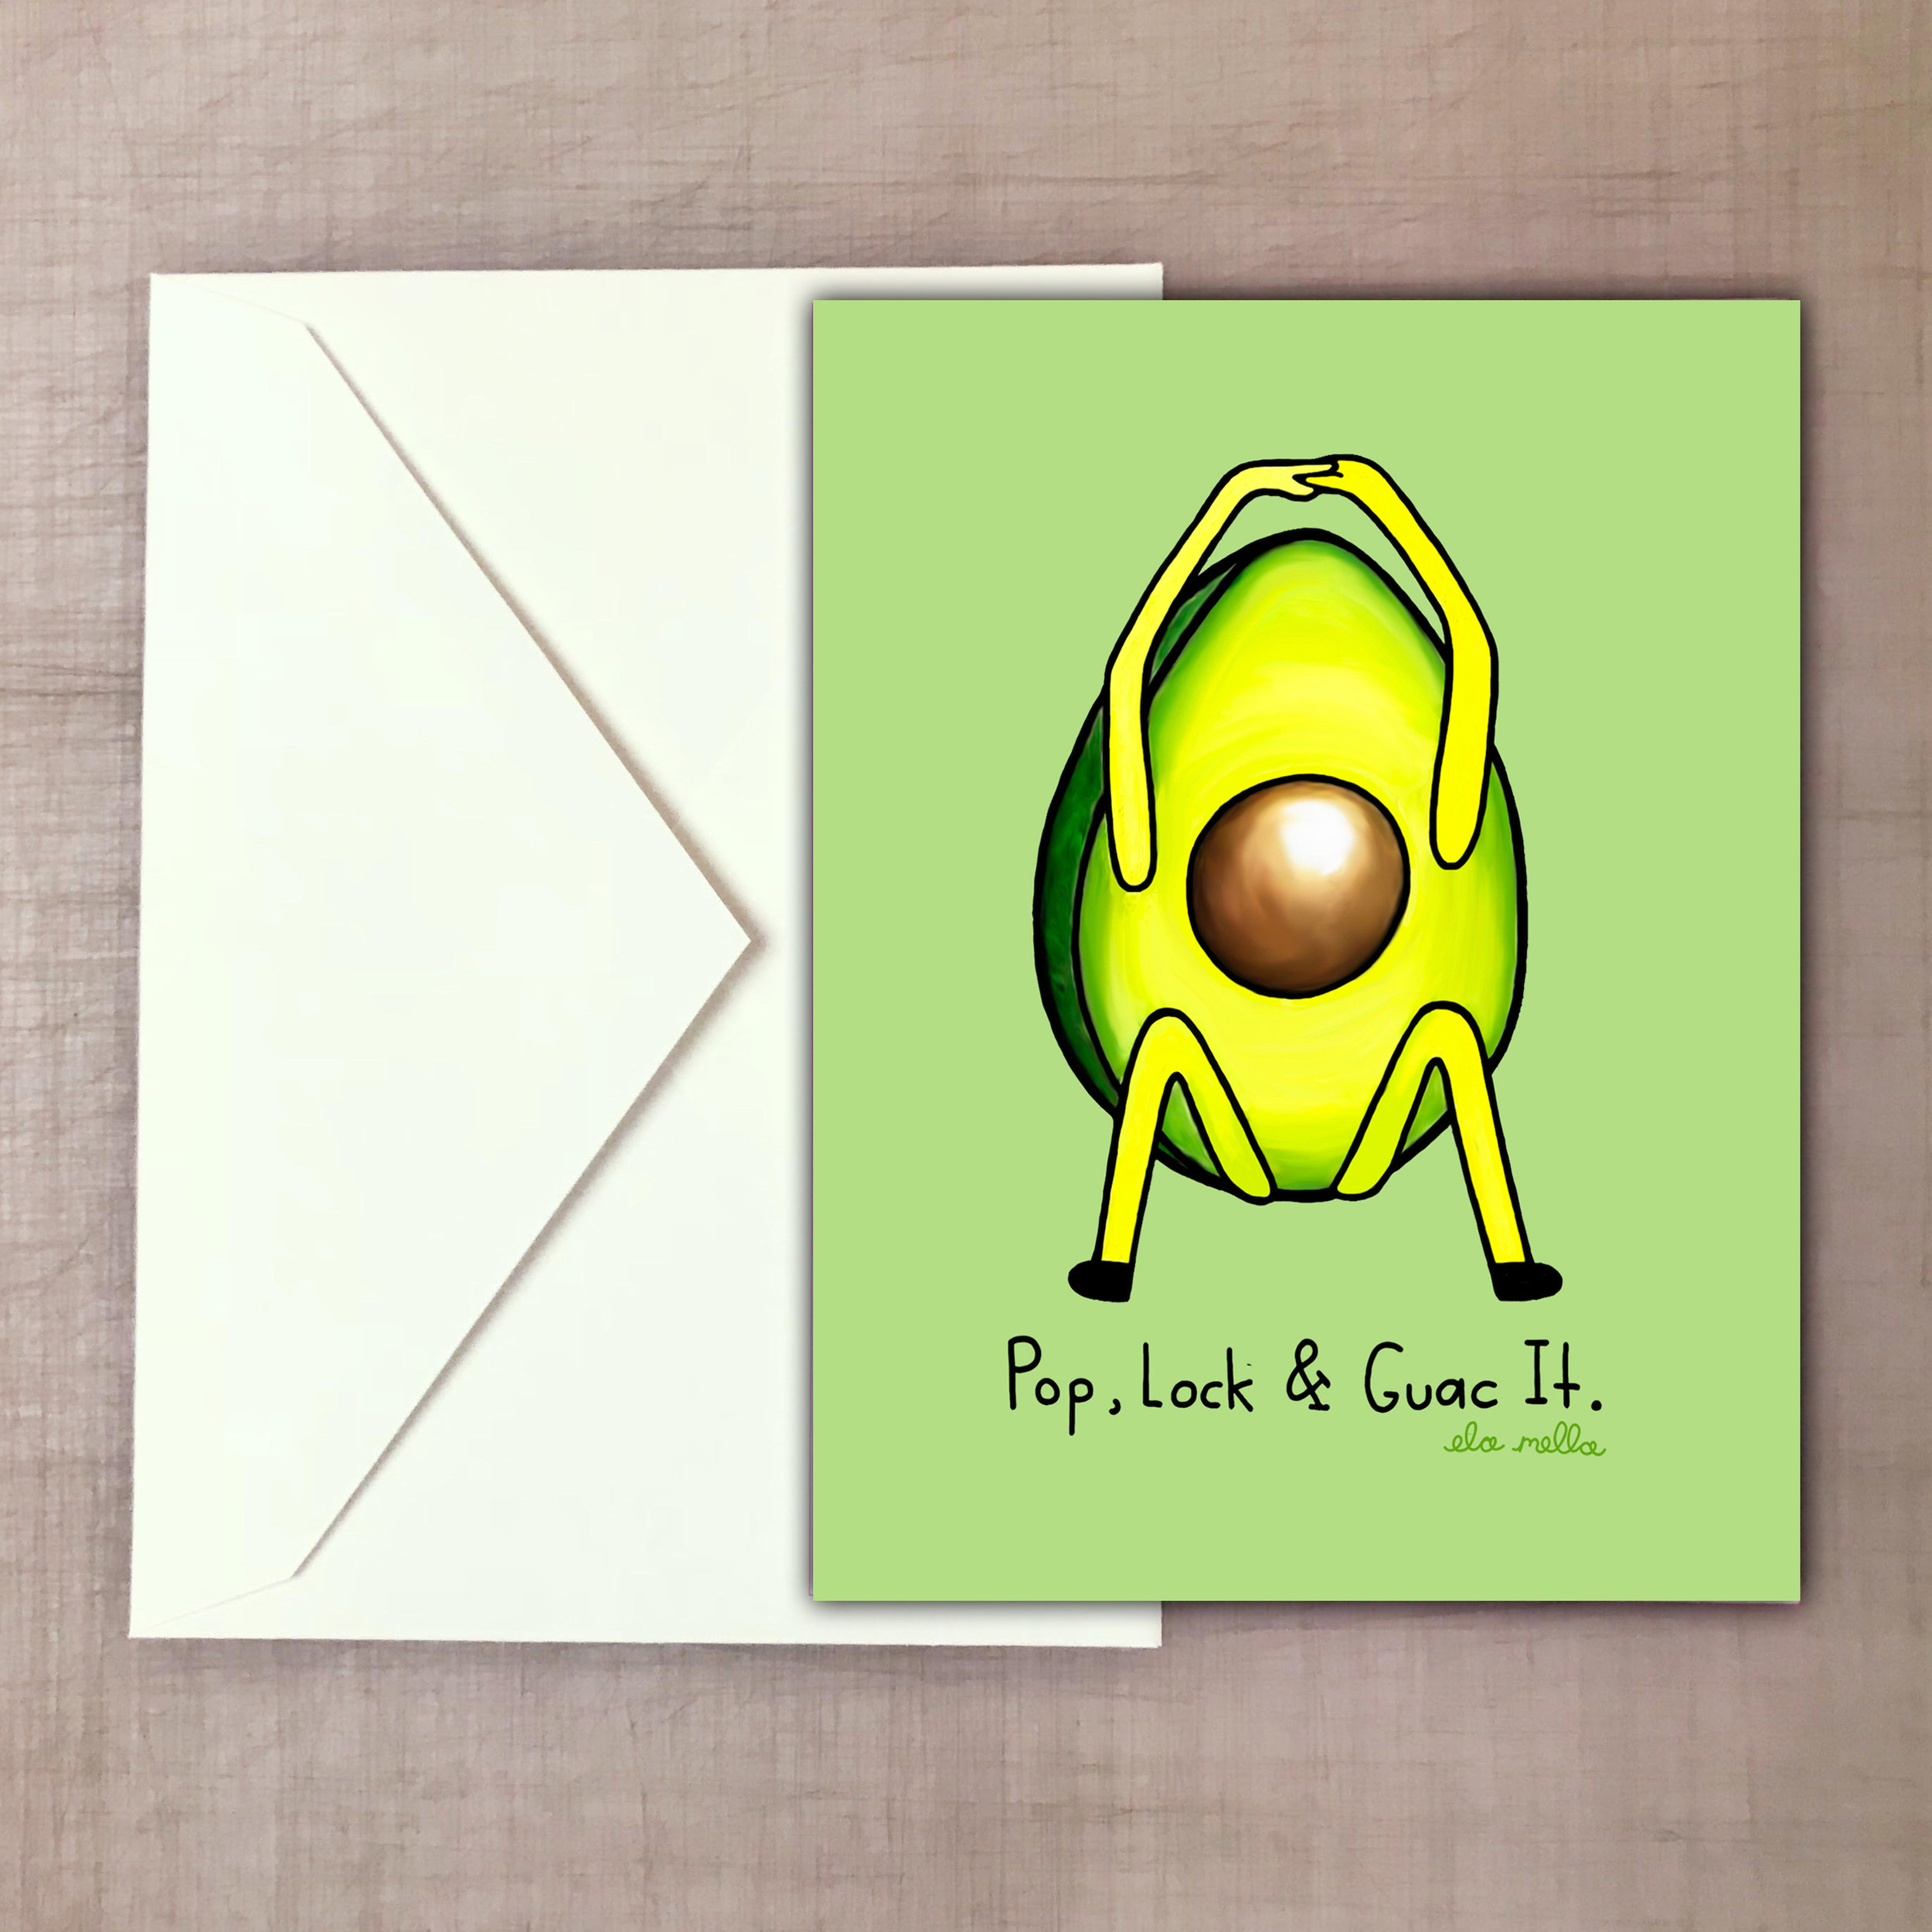 Pop Lock and Guac it greeting card.jpg